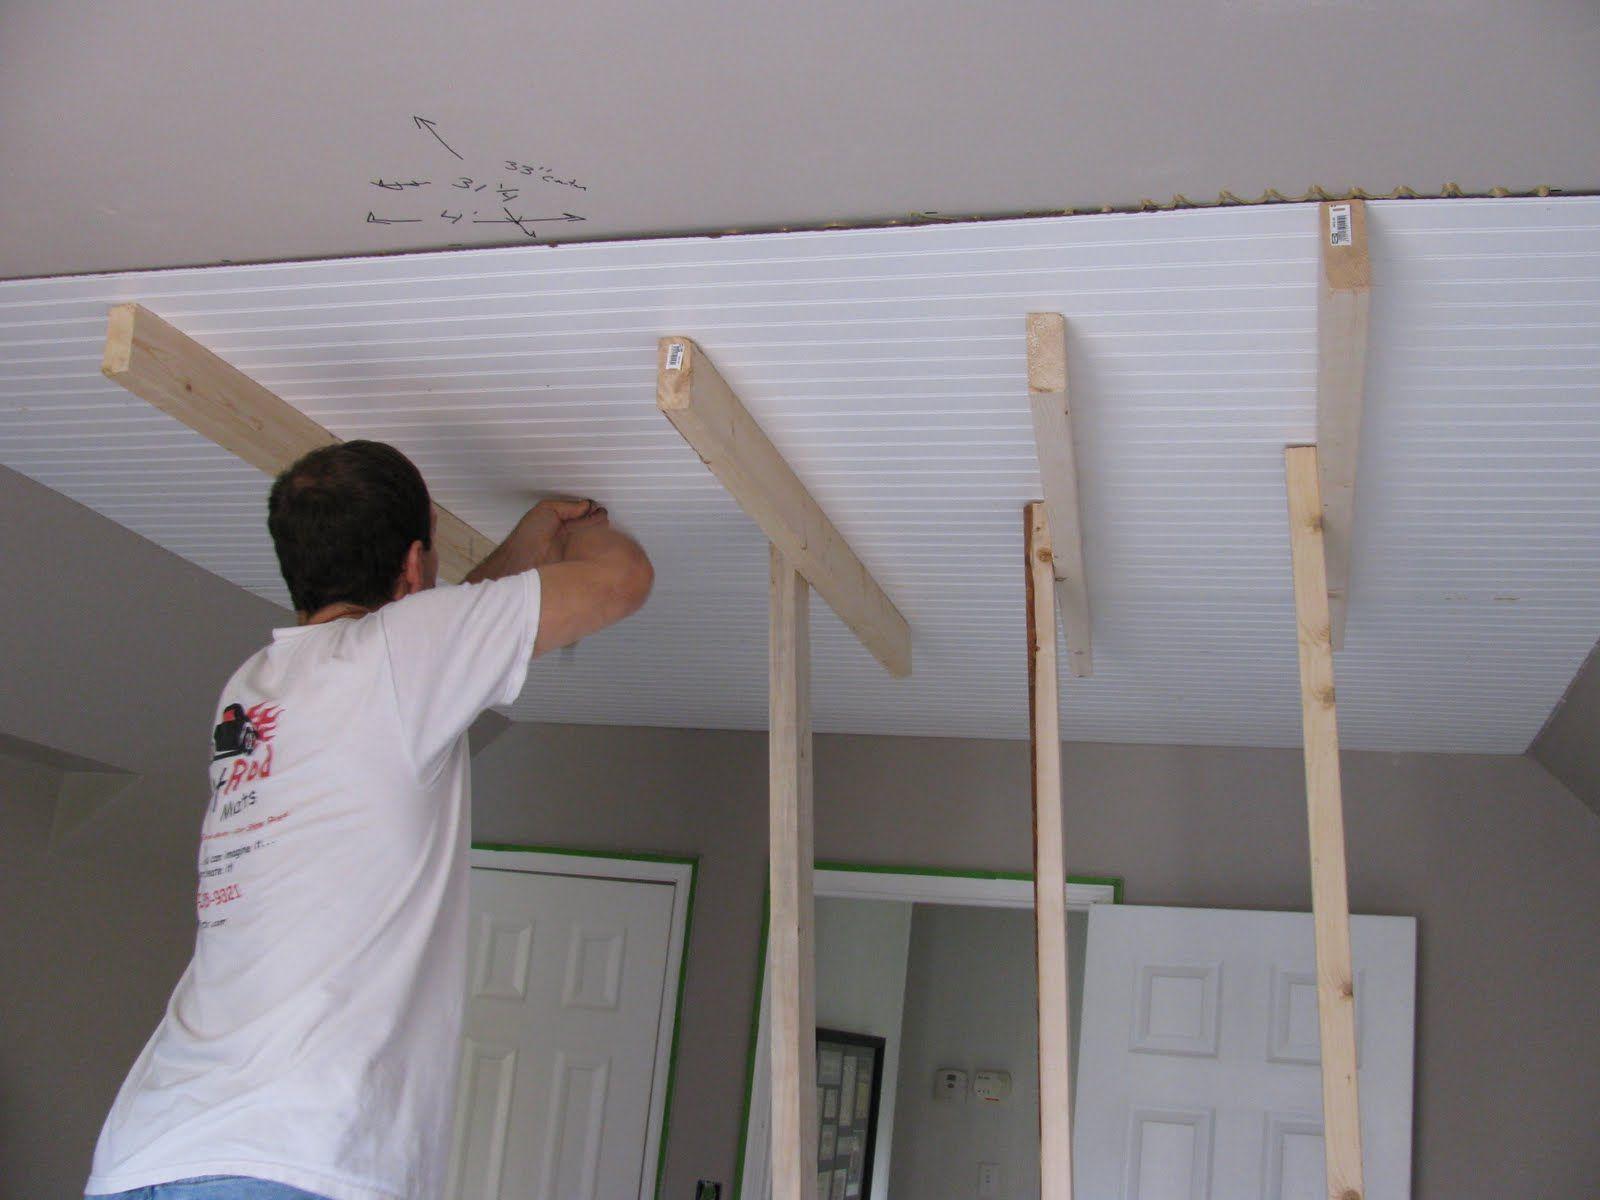 Beadboard Decorating Wainscoting Kits Flat Beaded Raised Wall Paneled Wainscoting